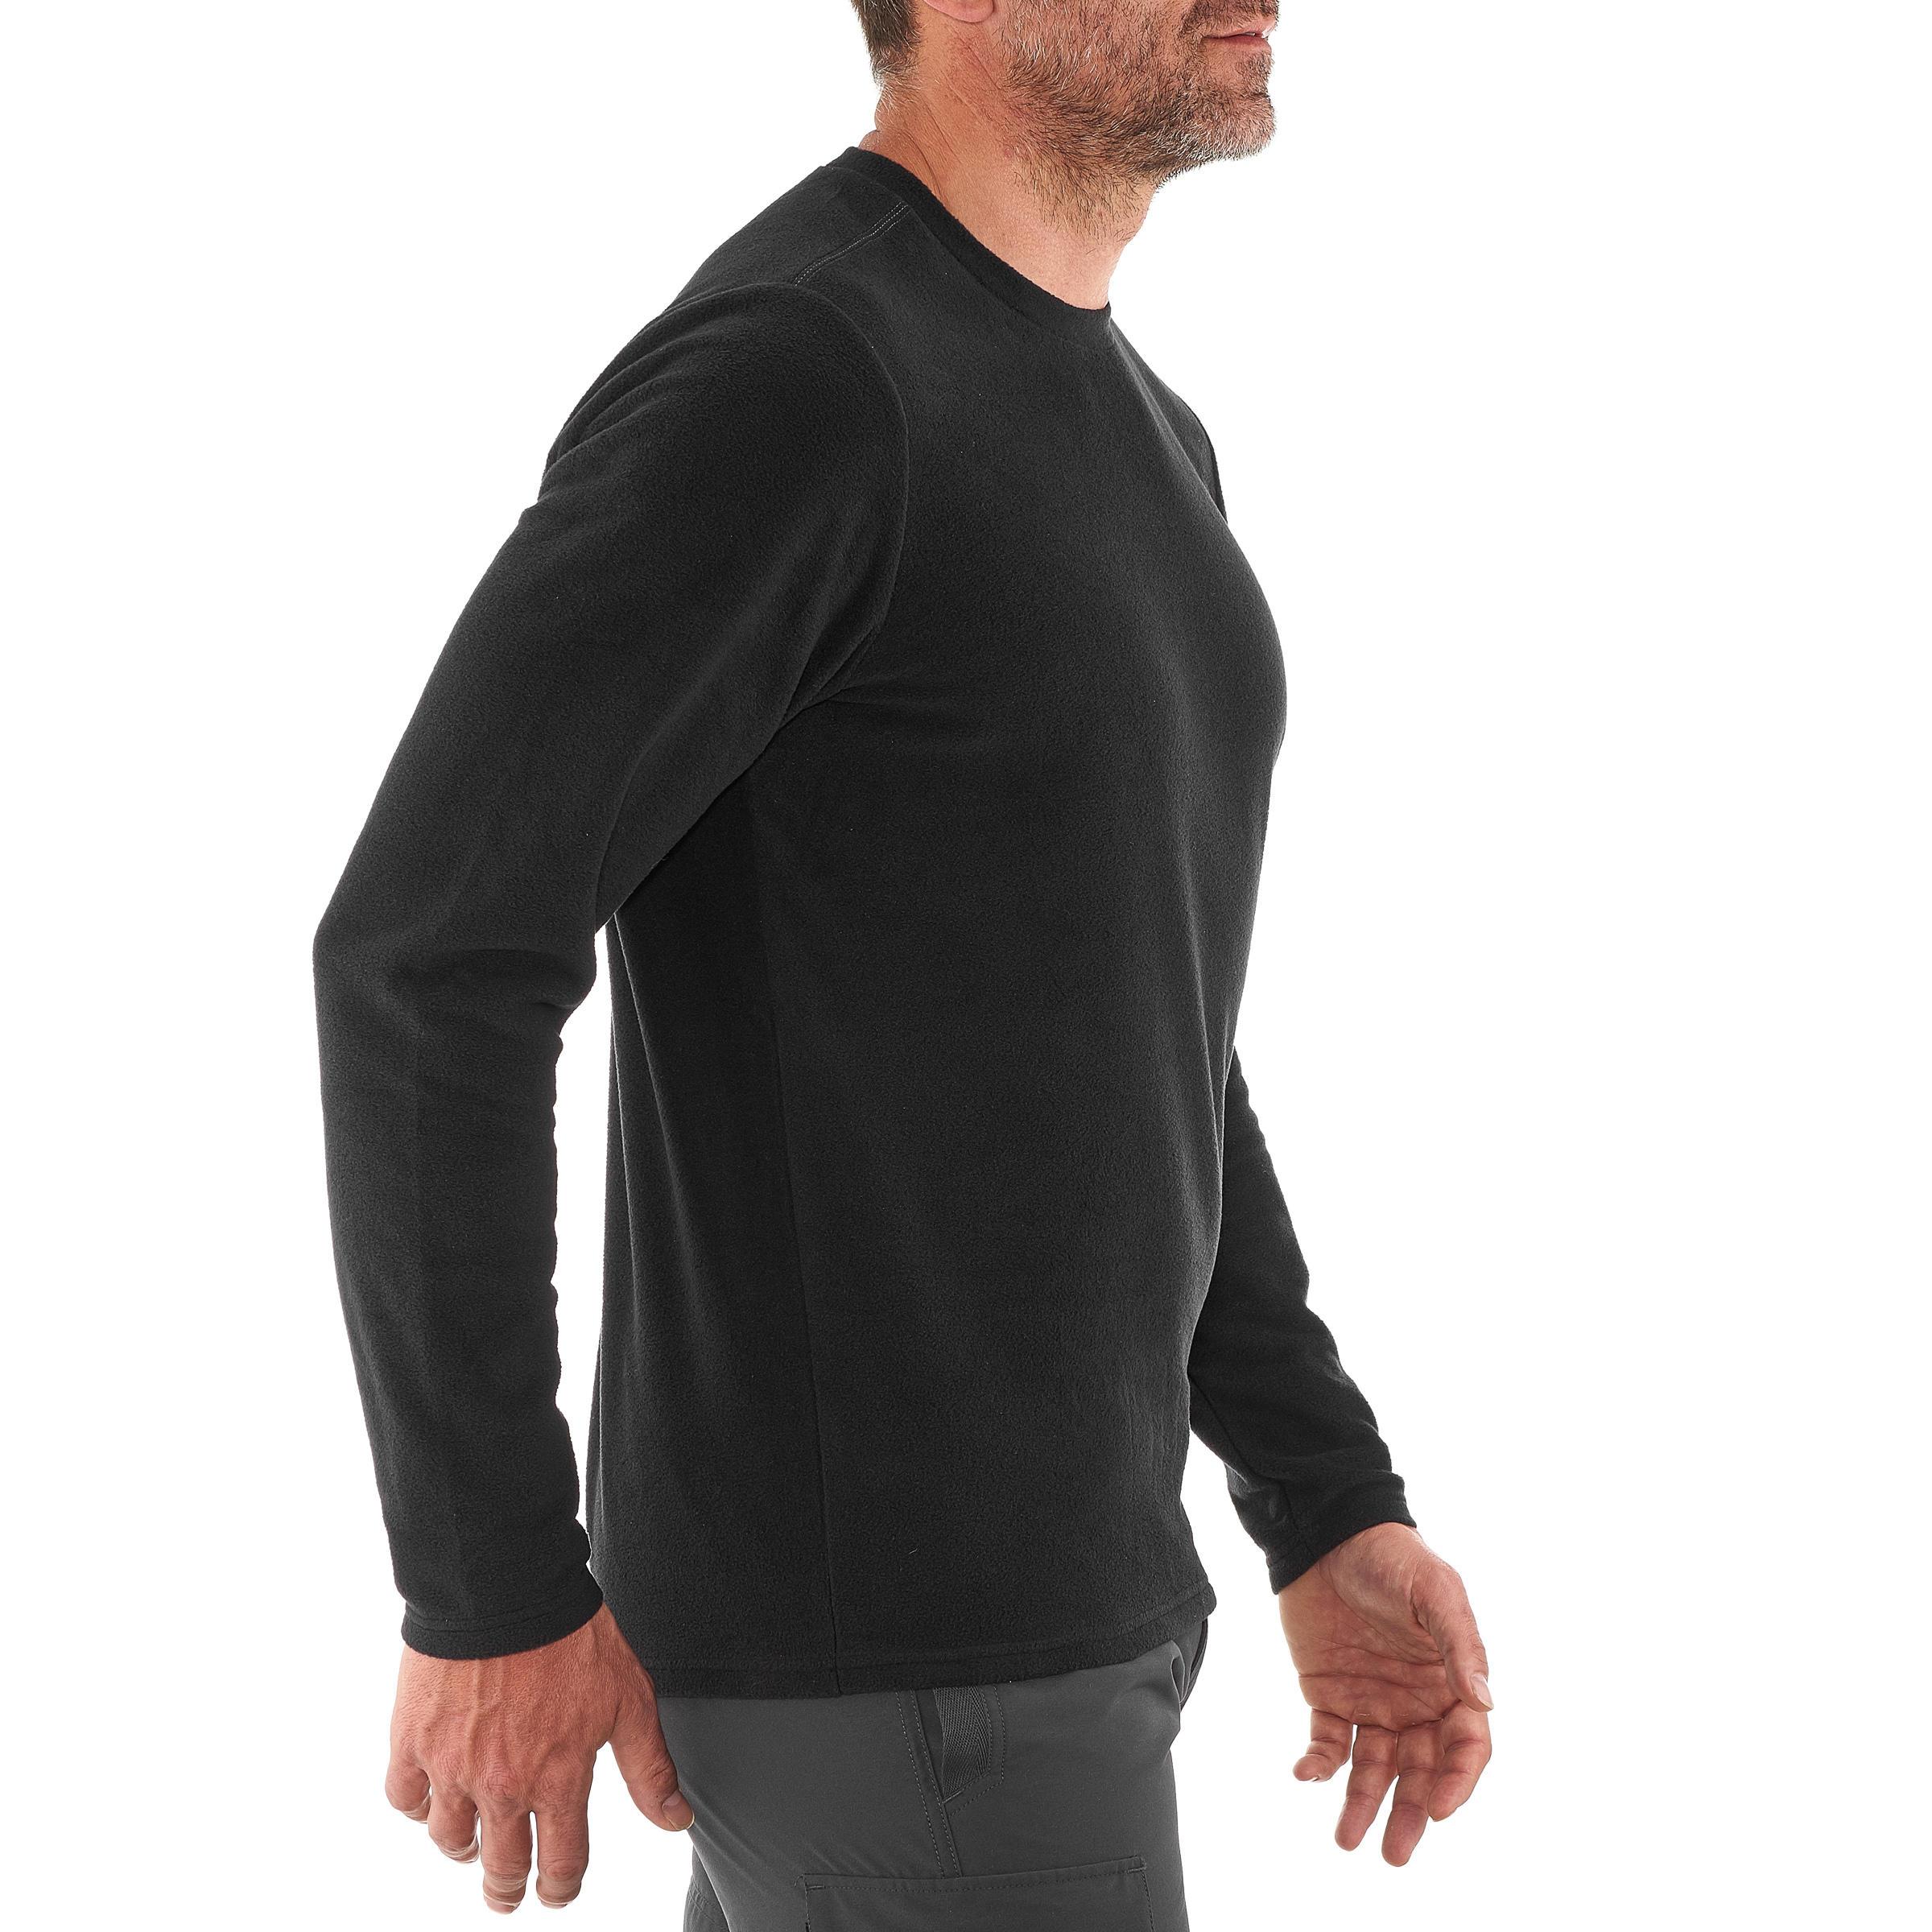 Men's Mountain Hiking Fleece MH20 - Black